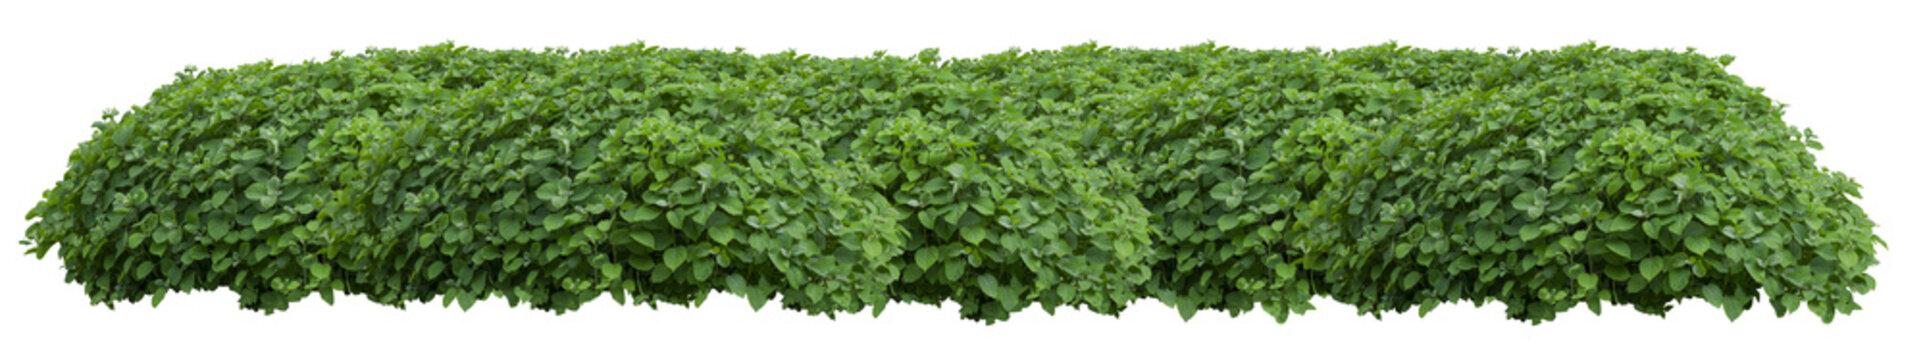 Green fresh ornamental wild hedge isolated on white background